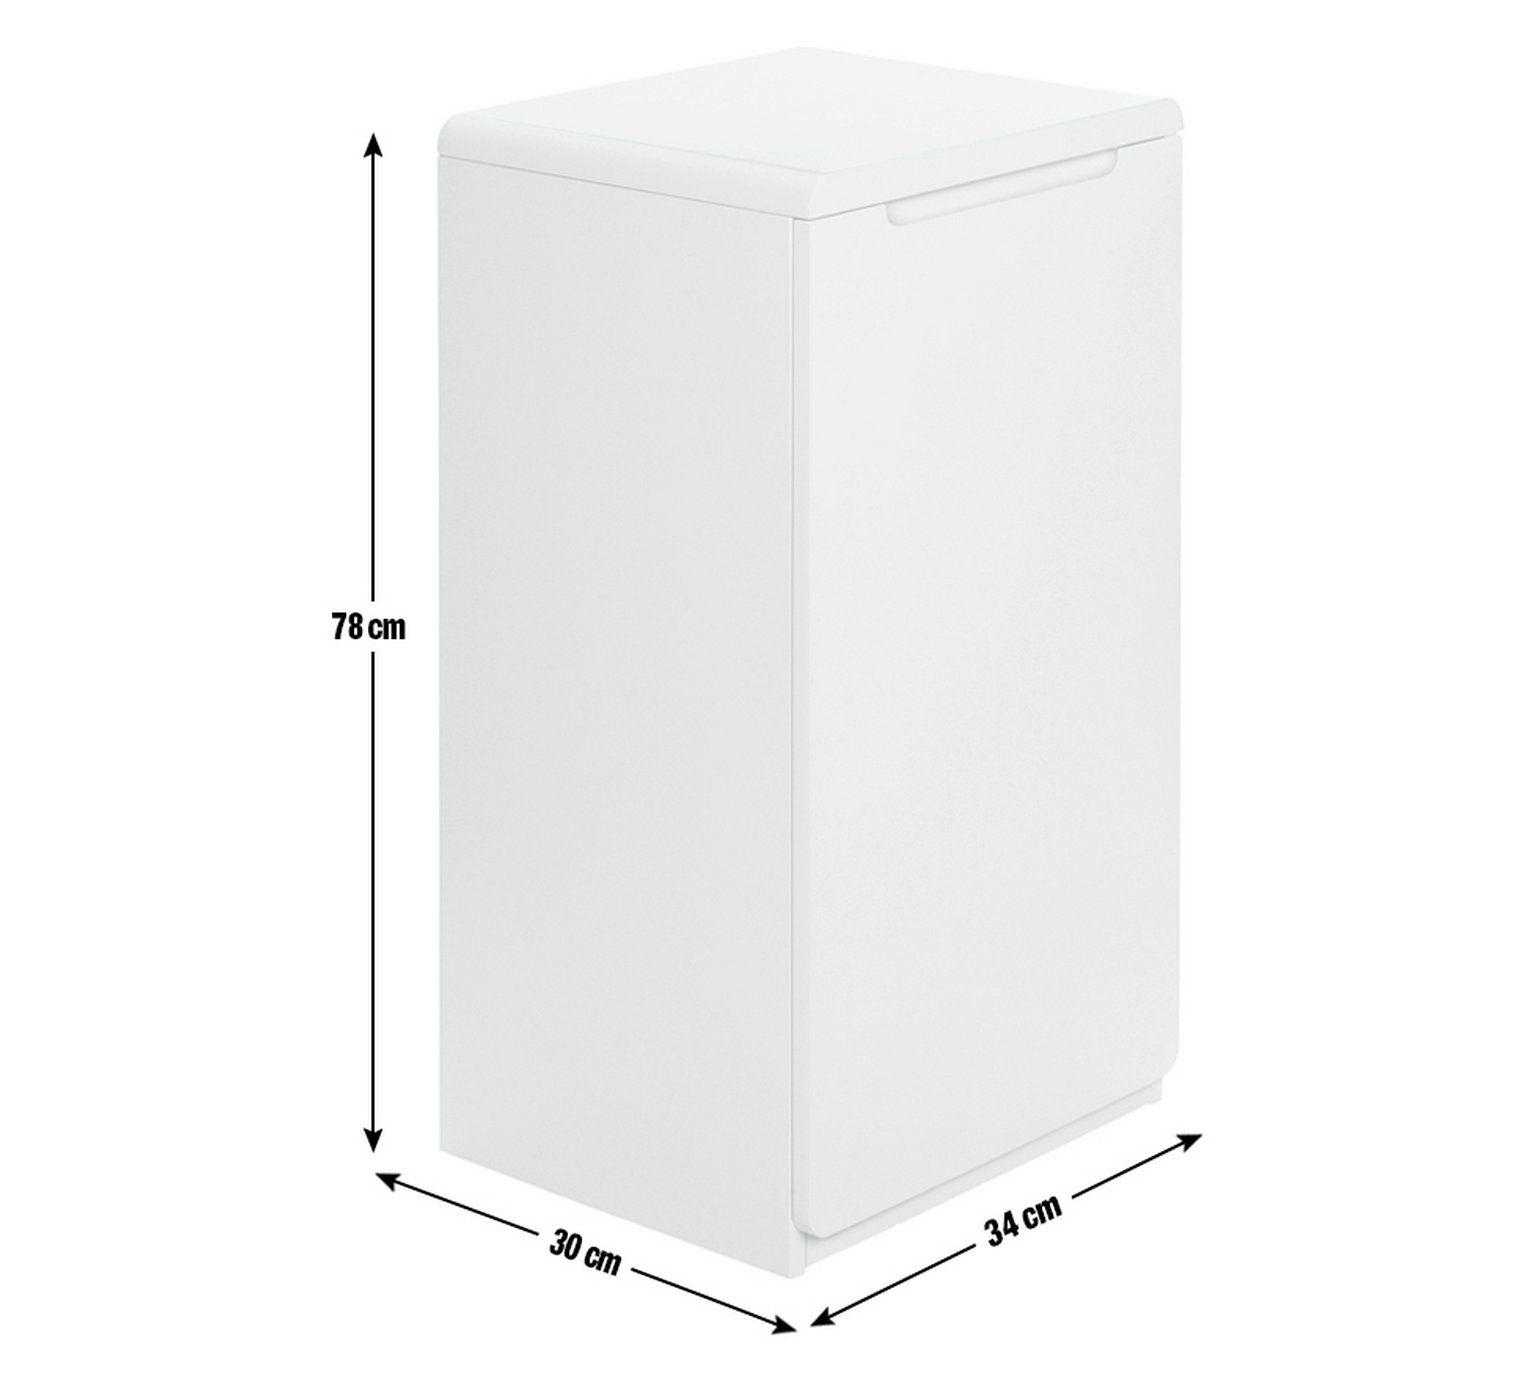 Buy Hygena Curve Laundry Cabinet At Argos Co Uk Visit Argos Co Uk To Shop Online For Linen Baskets And Laundry Bins Laundry Cabinets Linen Baskets Argos Home